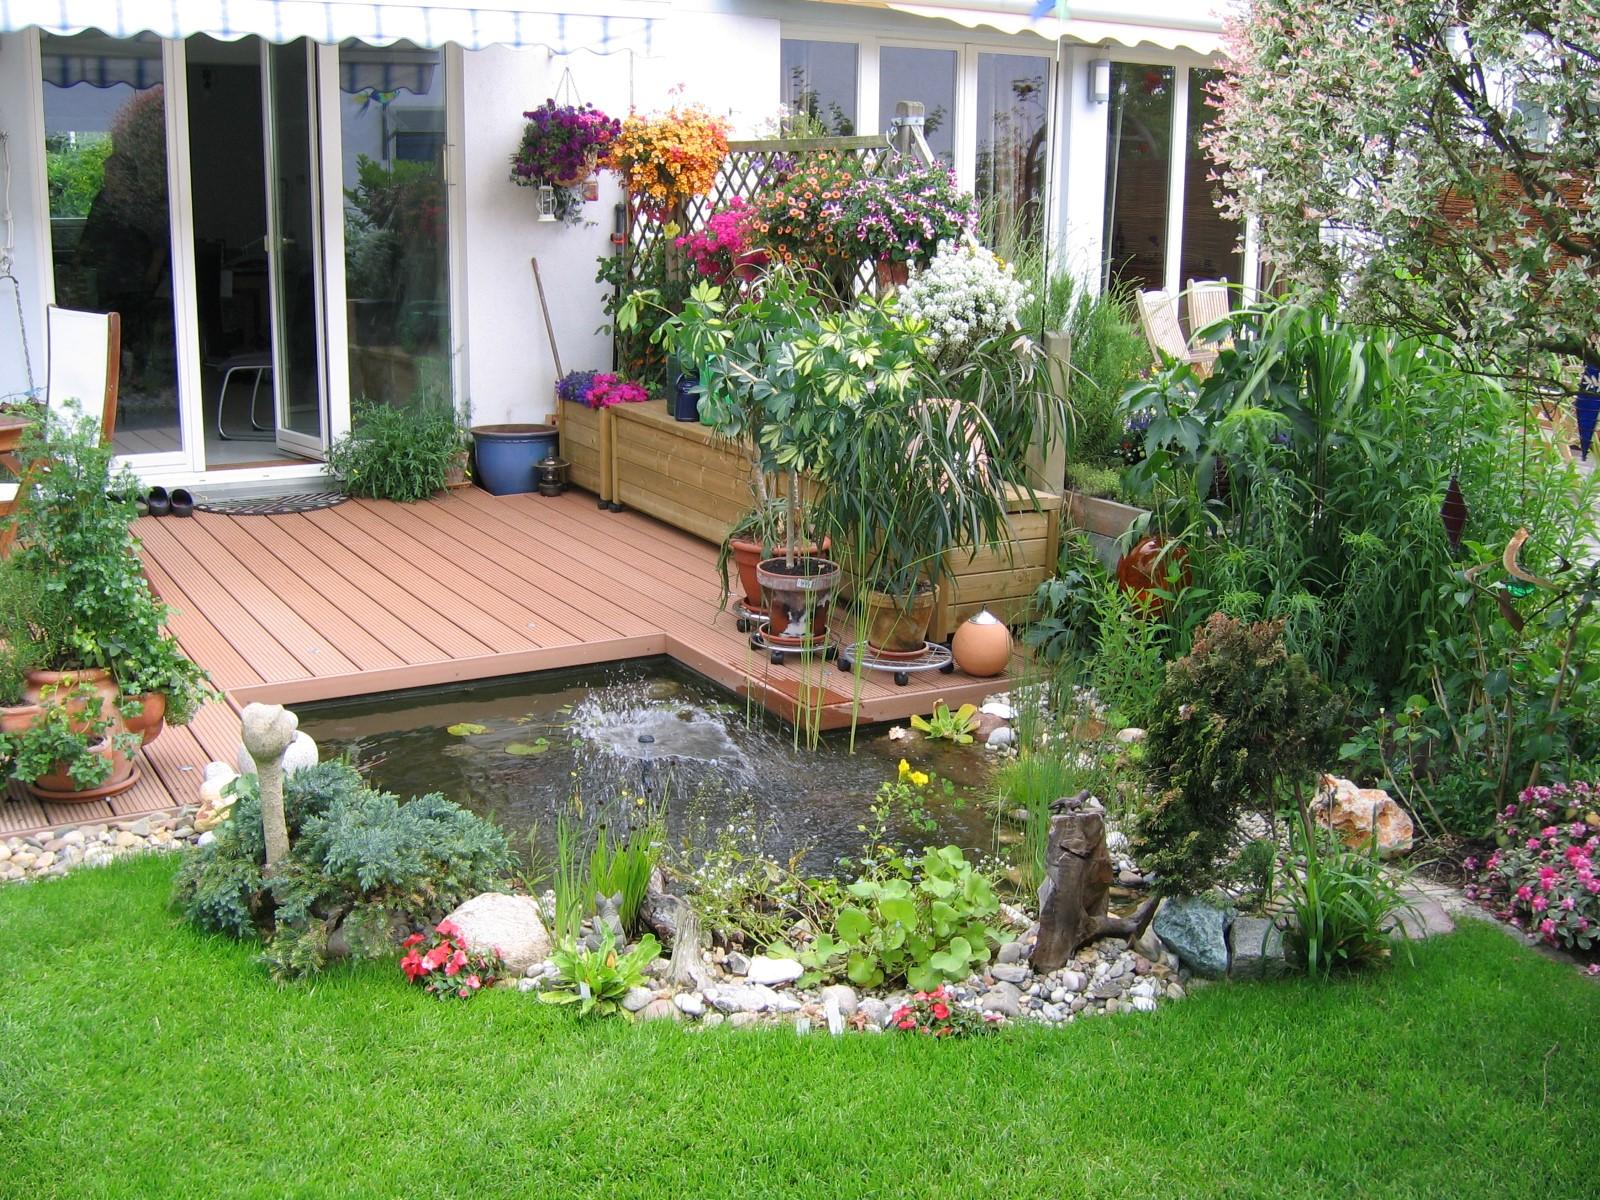 Gartengestaltung - Grüne Oase